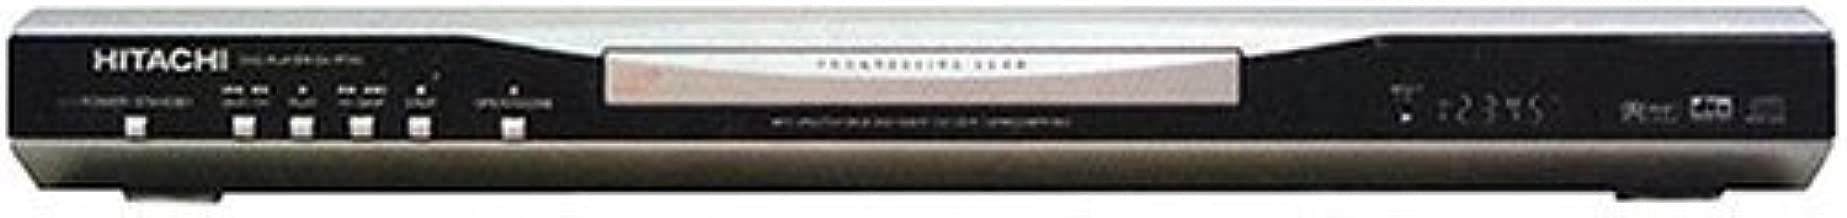 HITACHI DV-P745U Progressive Scan DVD Player